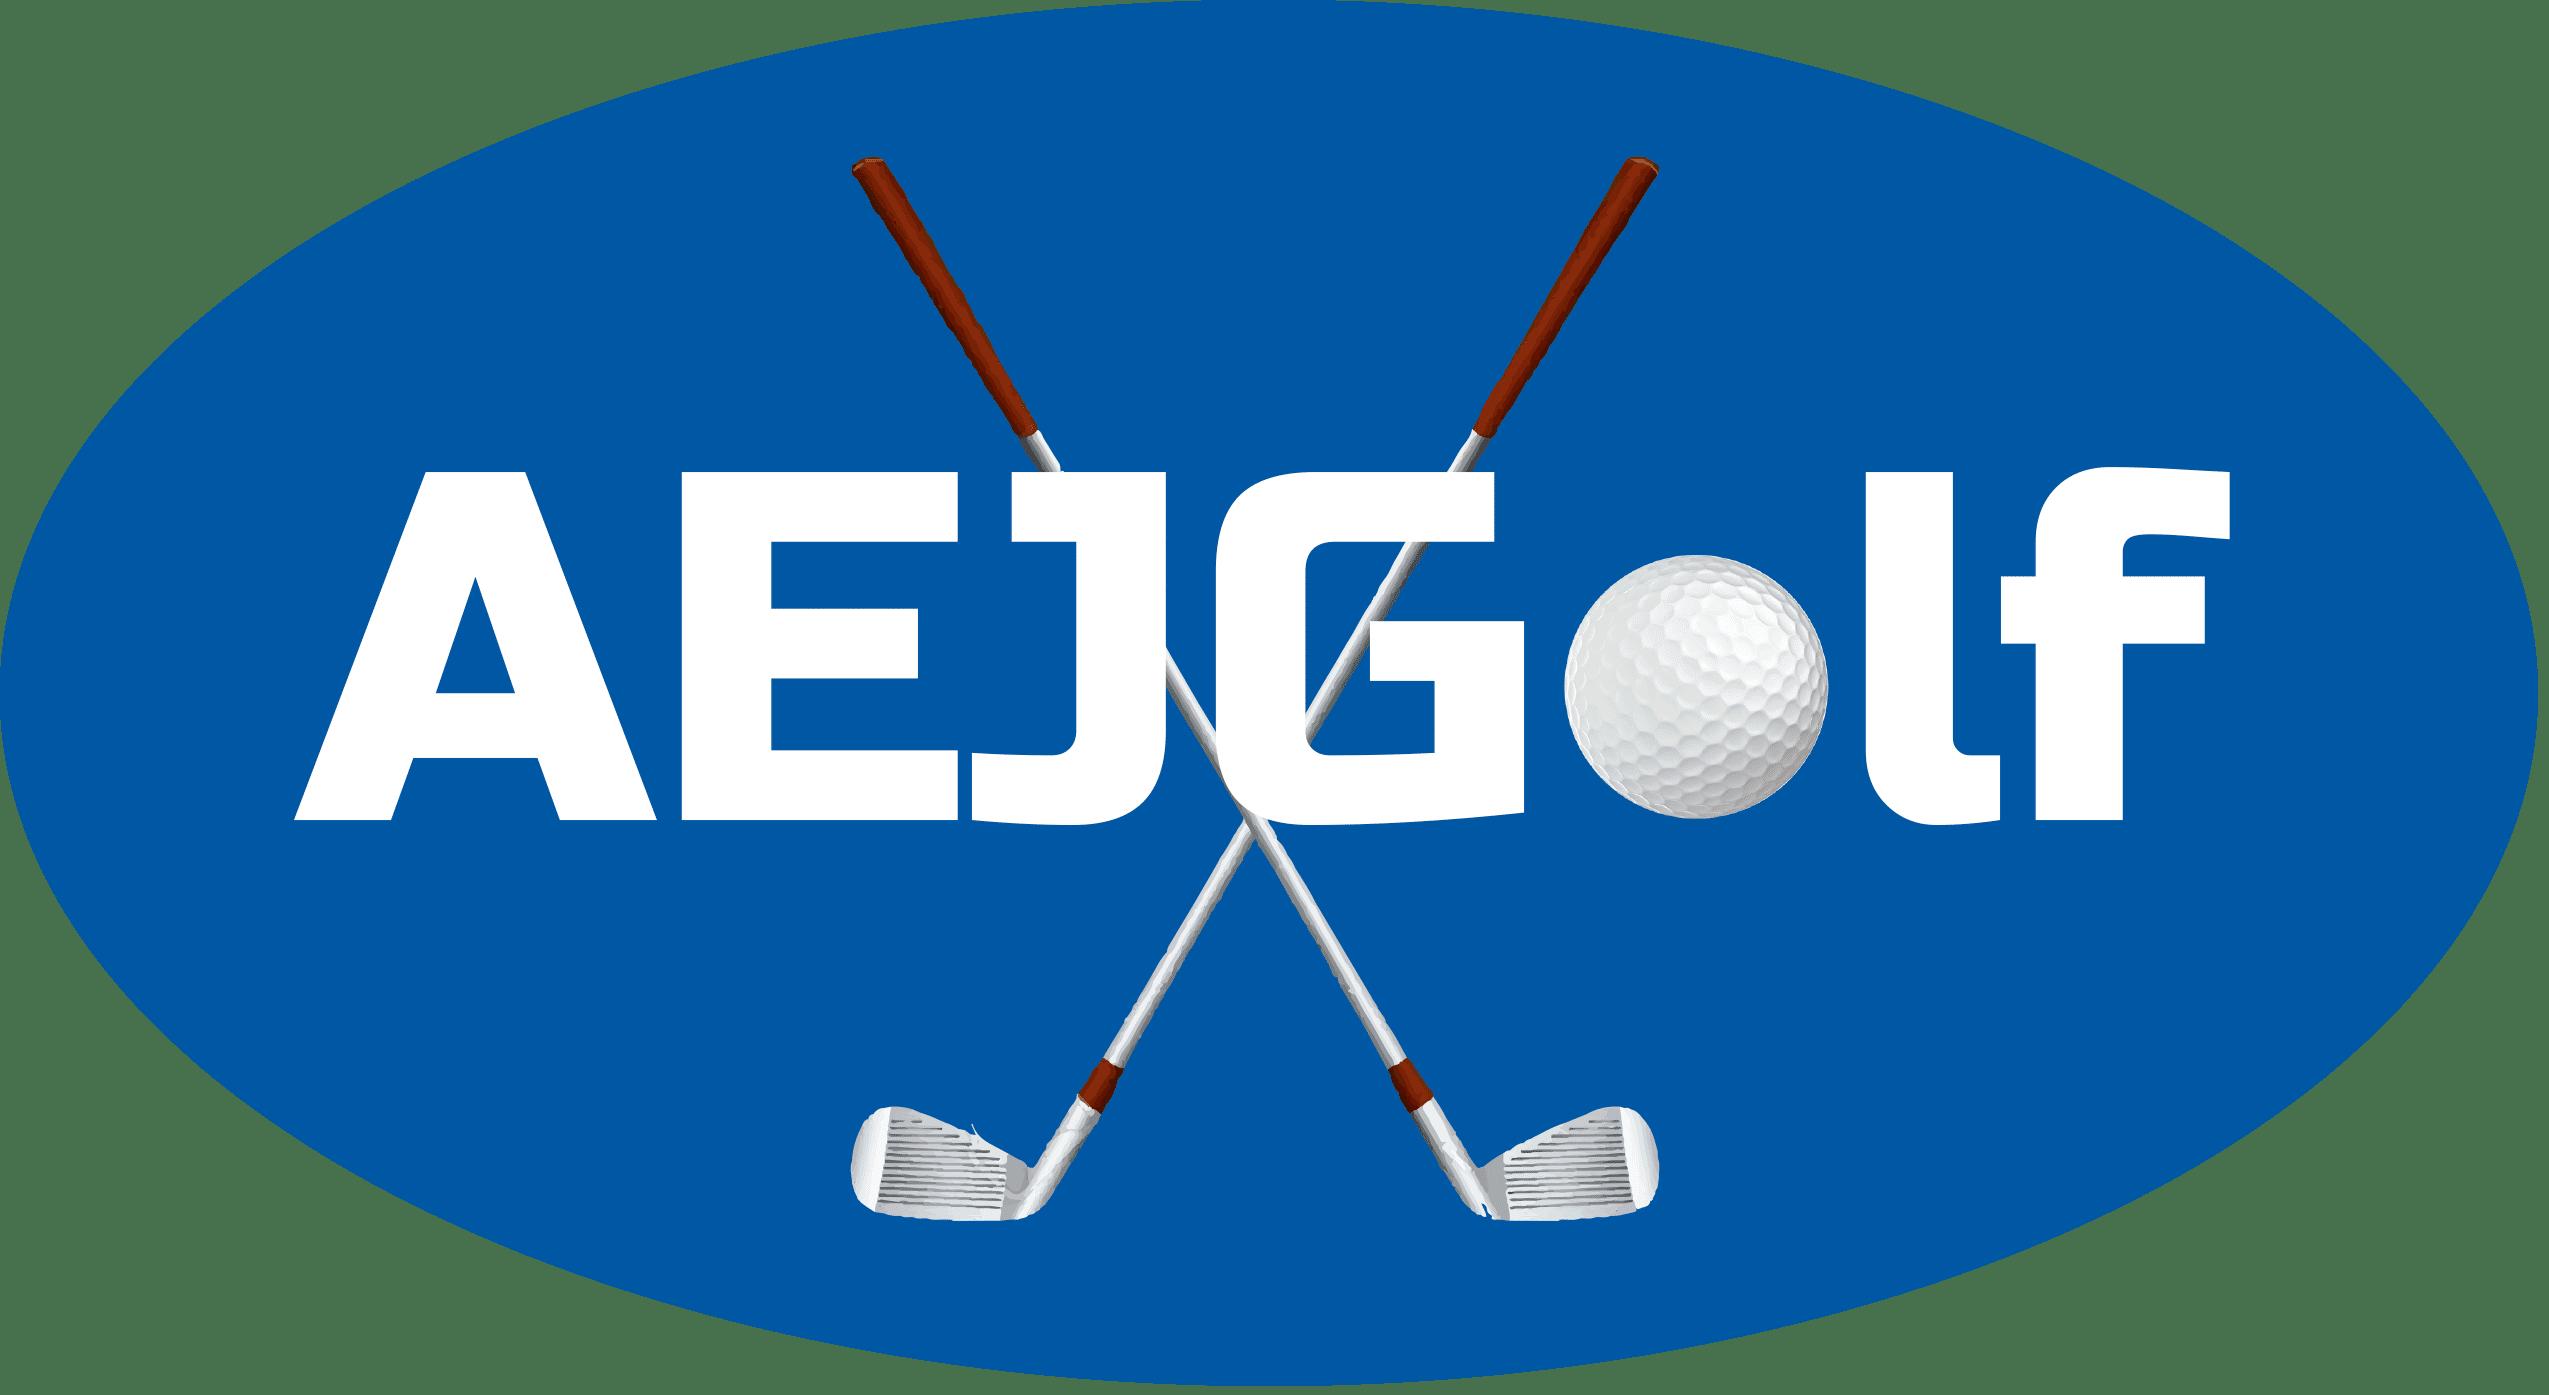 AEJGOLF